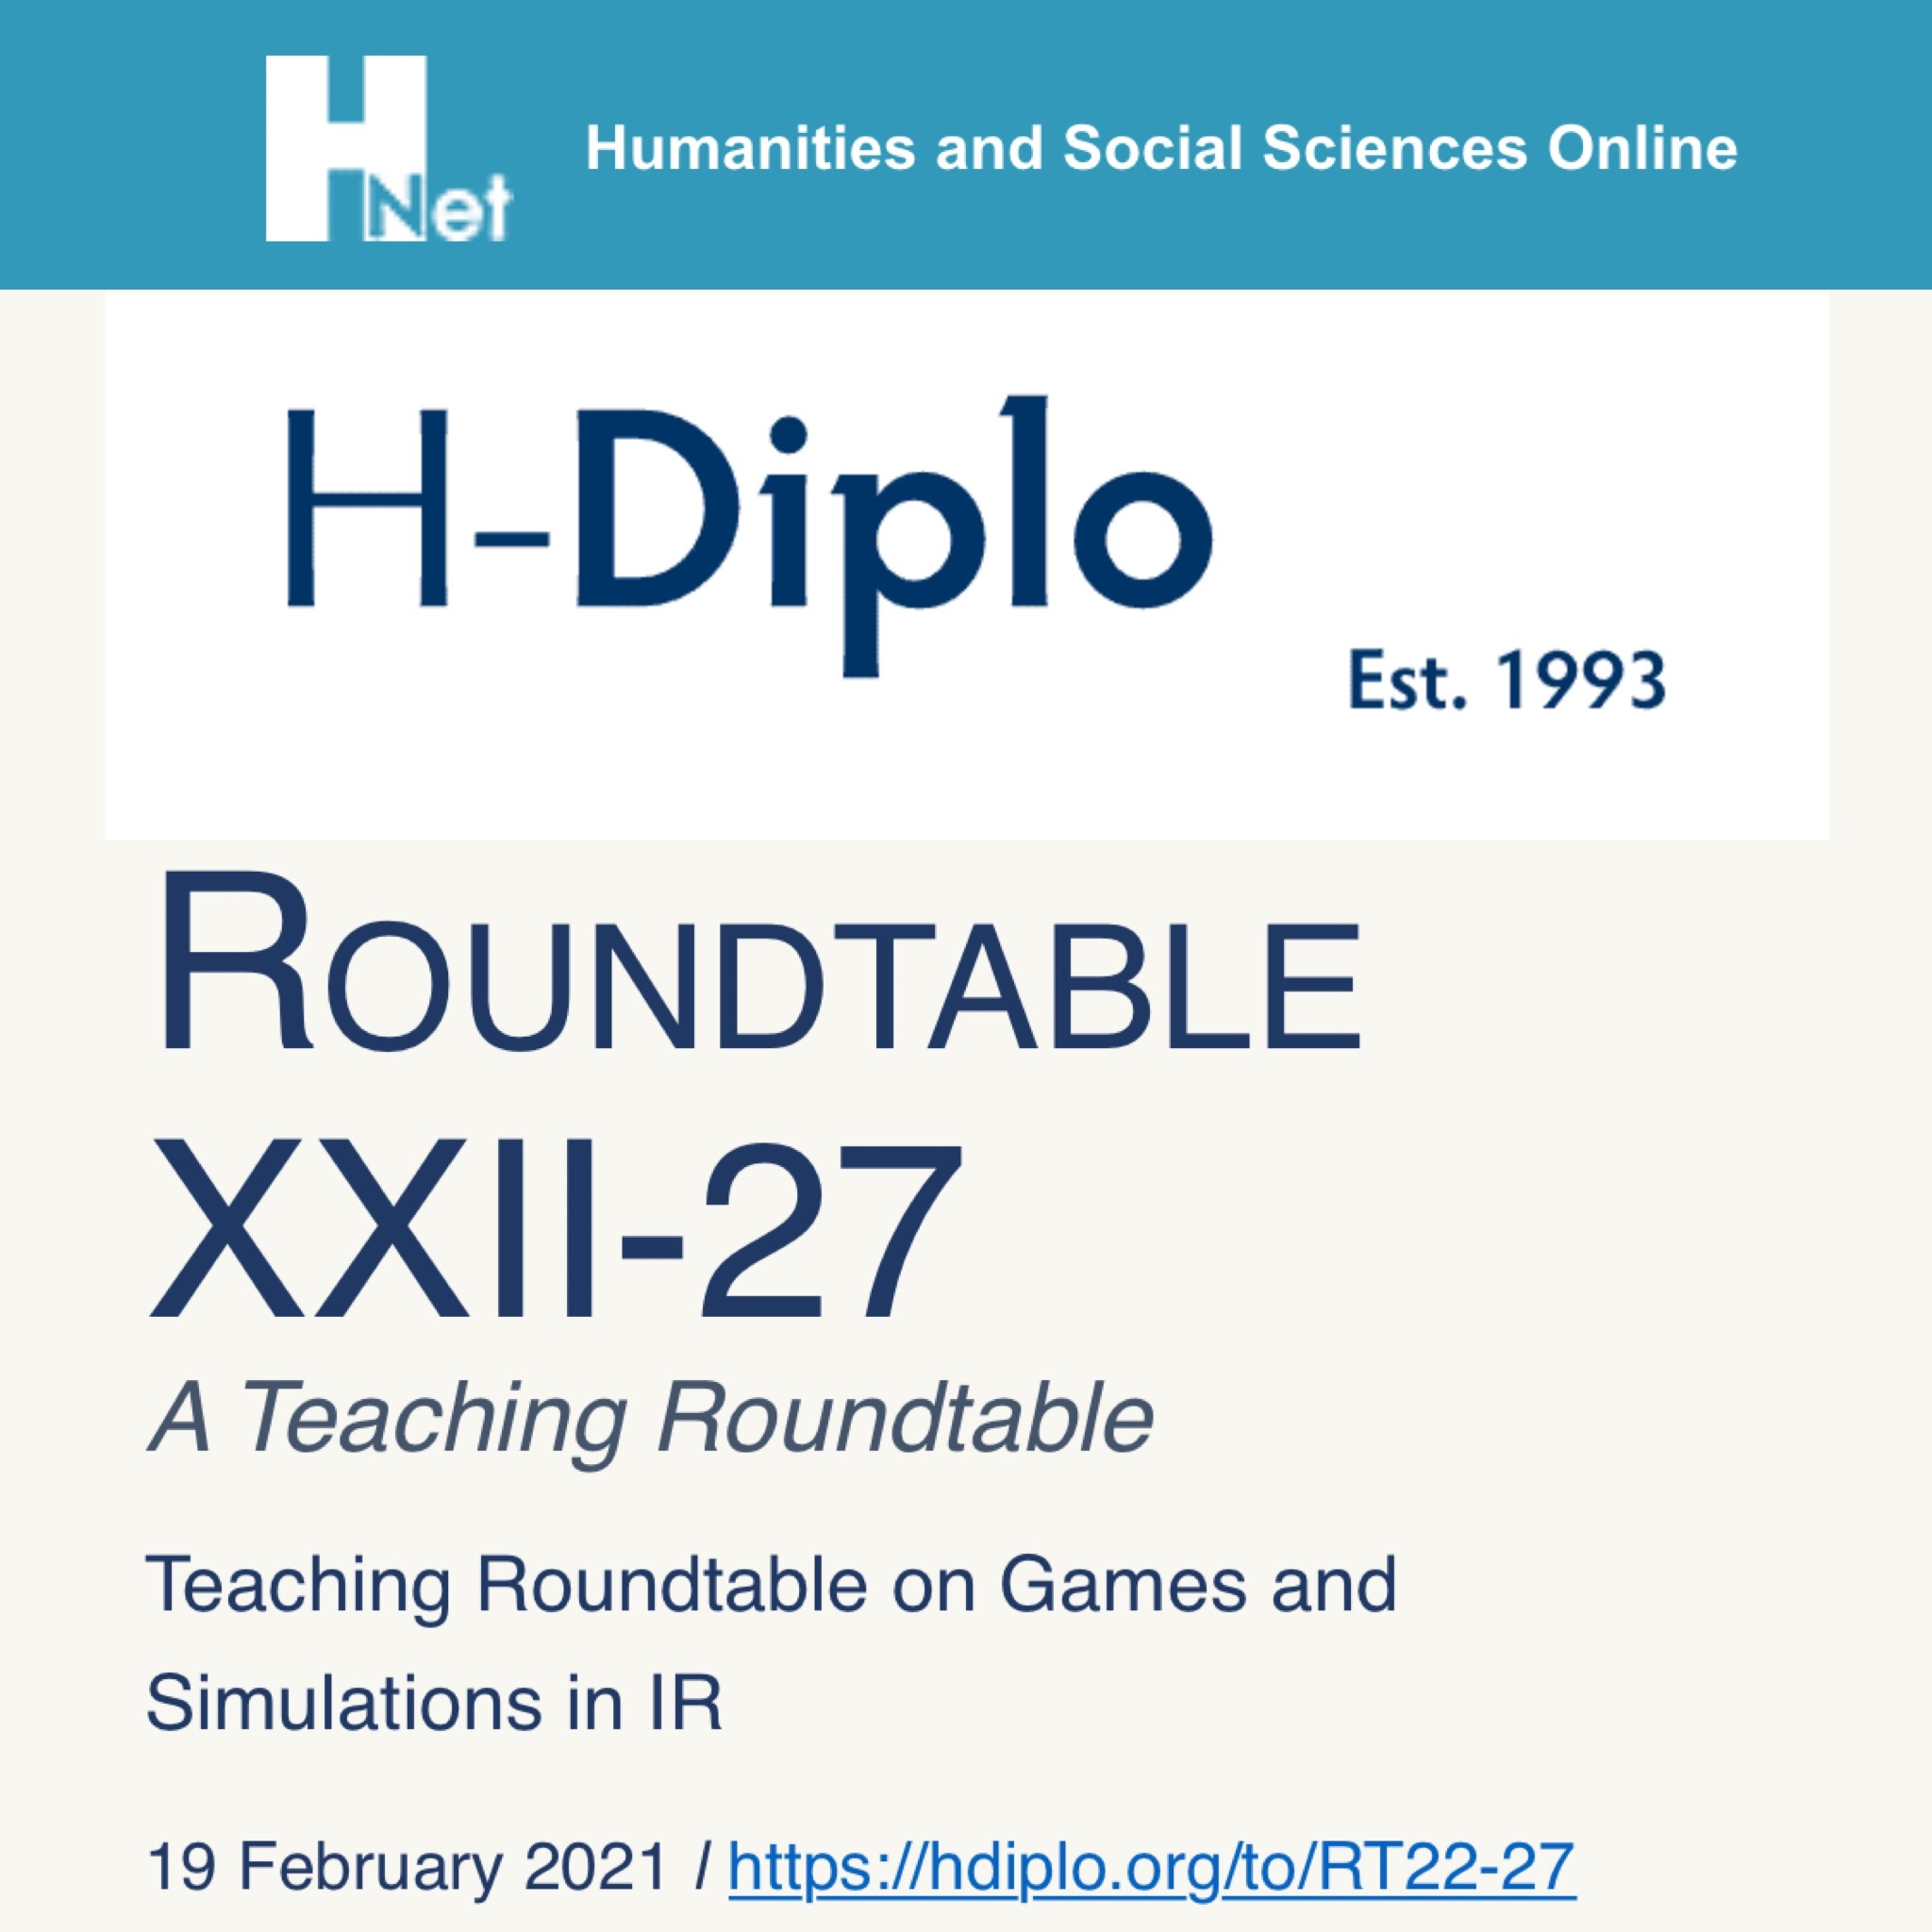 h-diplo_teaching_roundtable_on_games_simulations.JPG